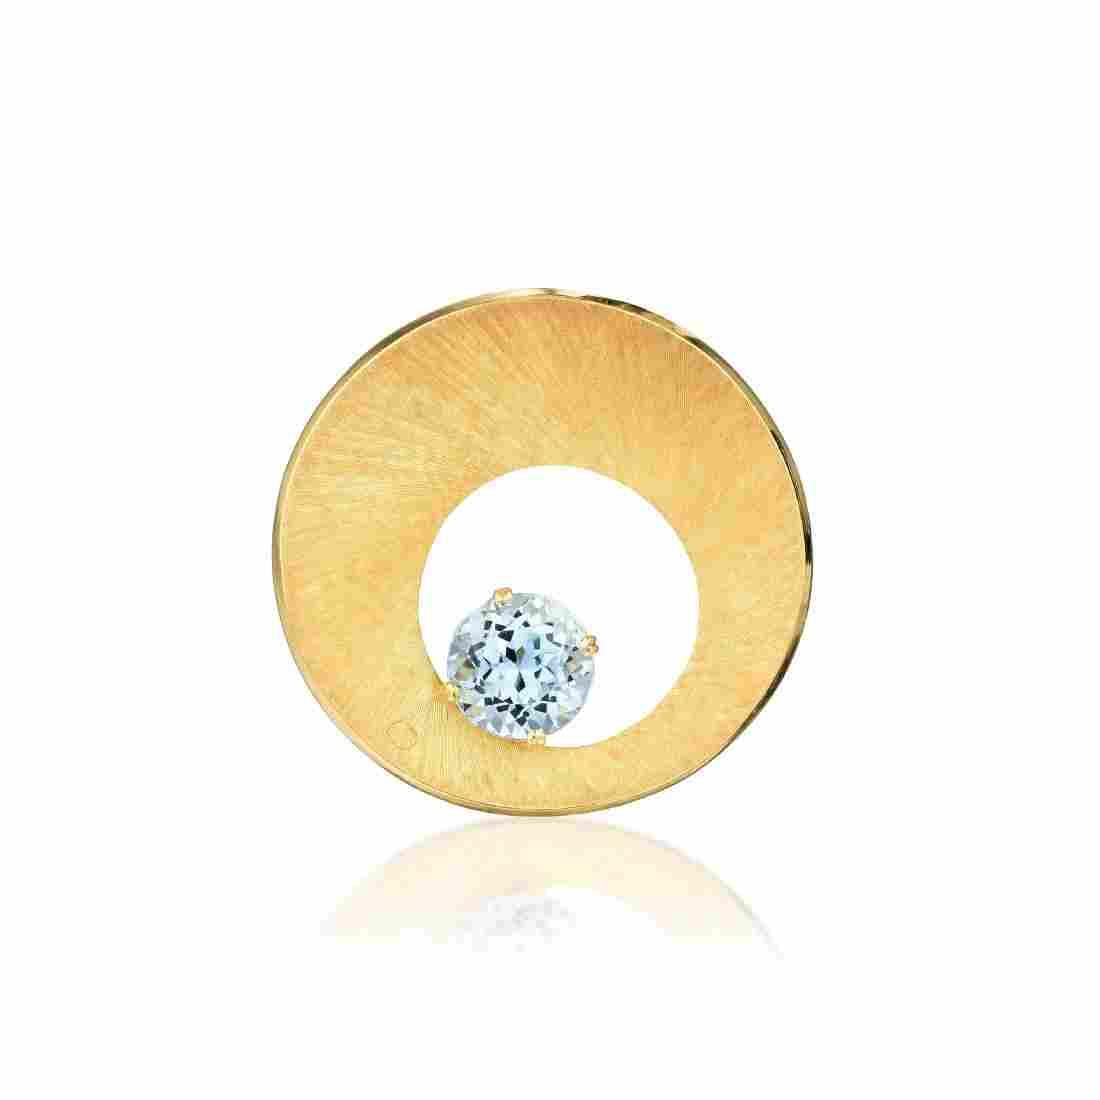 A Modernist Gold and Aquamarine Pendant / Brooch